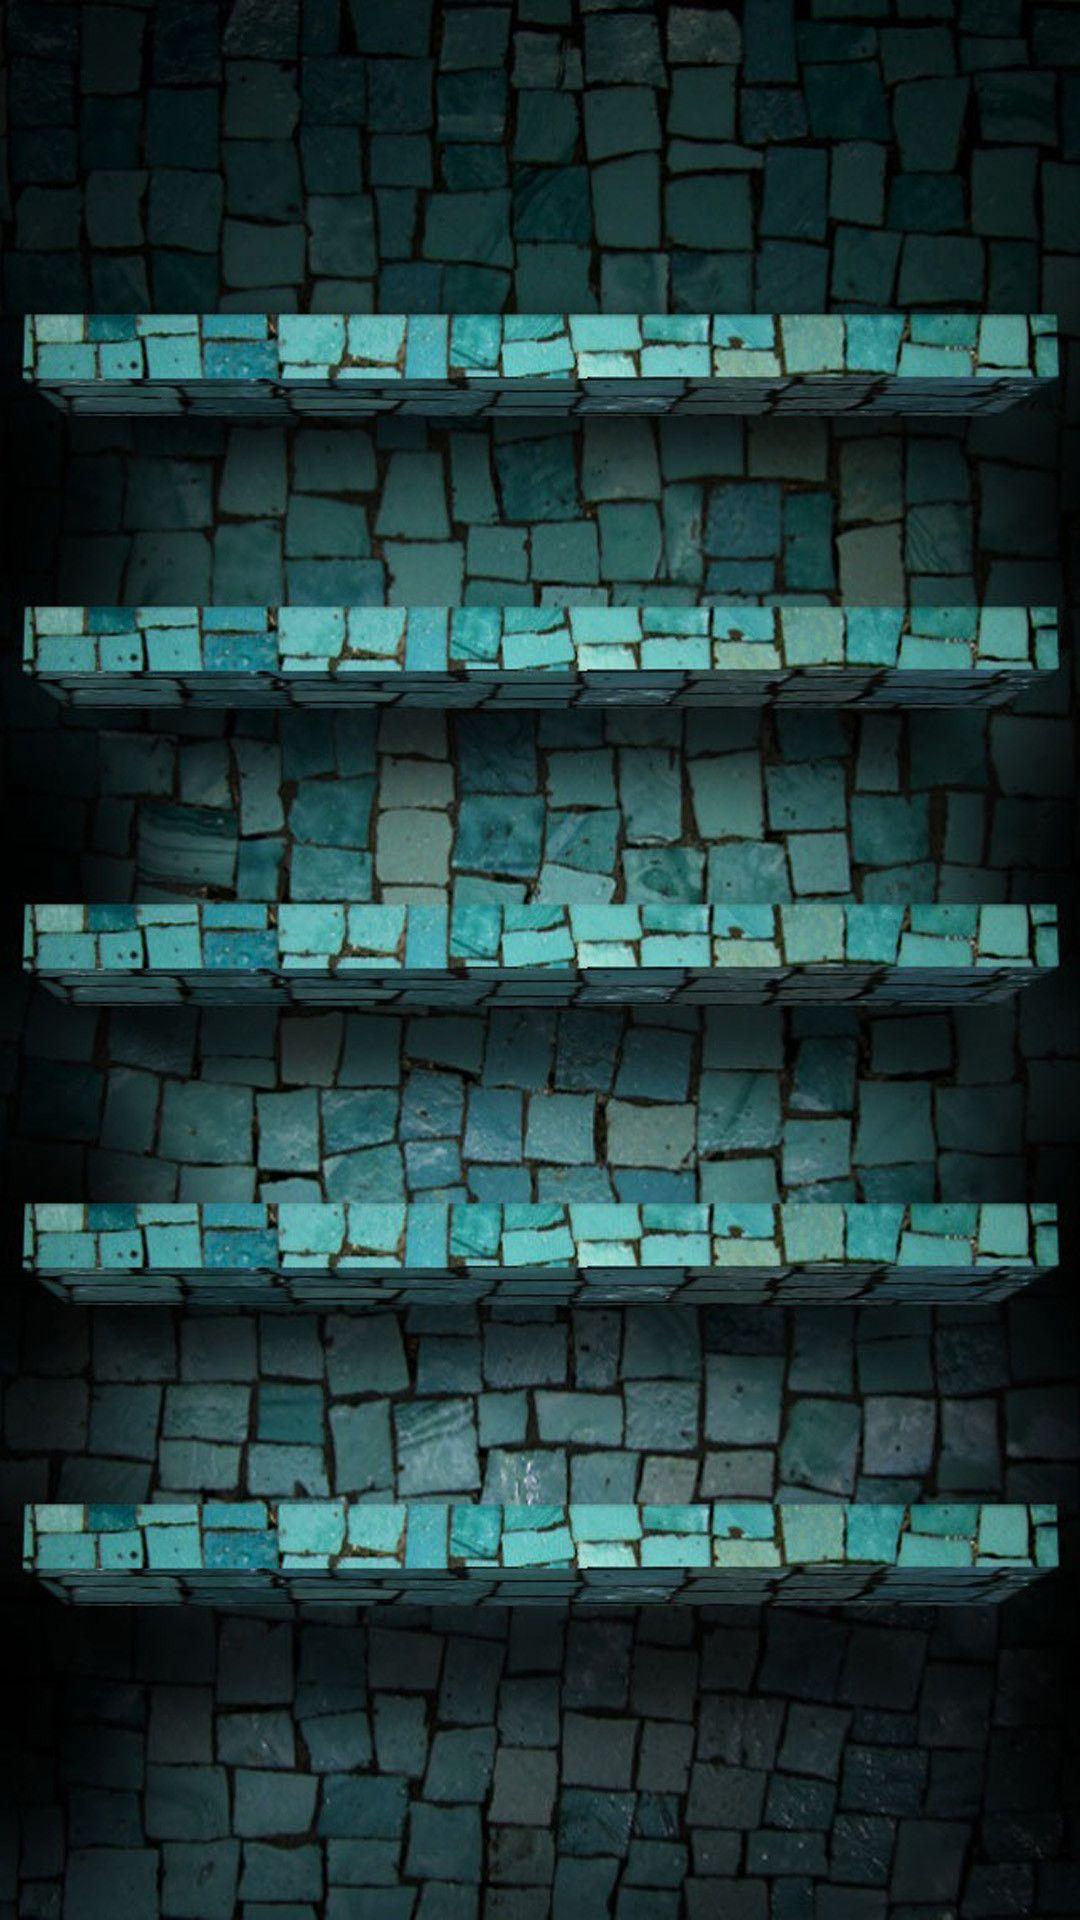 Iphone Home Screen 4k Wallpapers Wallpaper Cave